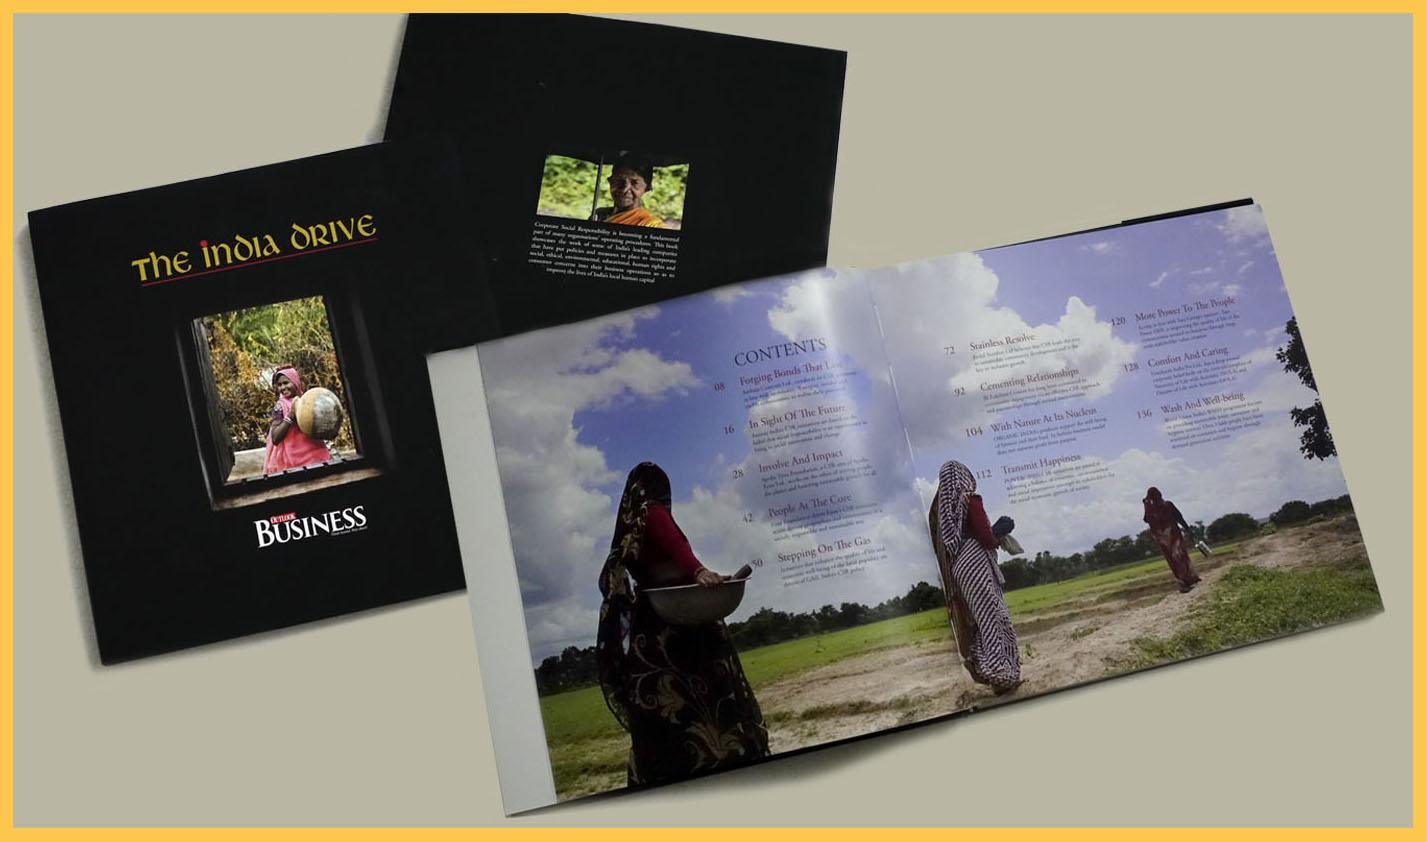 india-drive-book-1